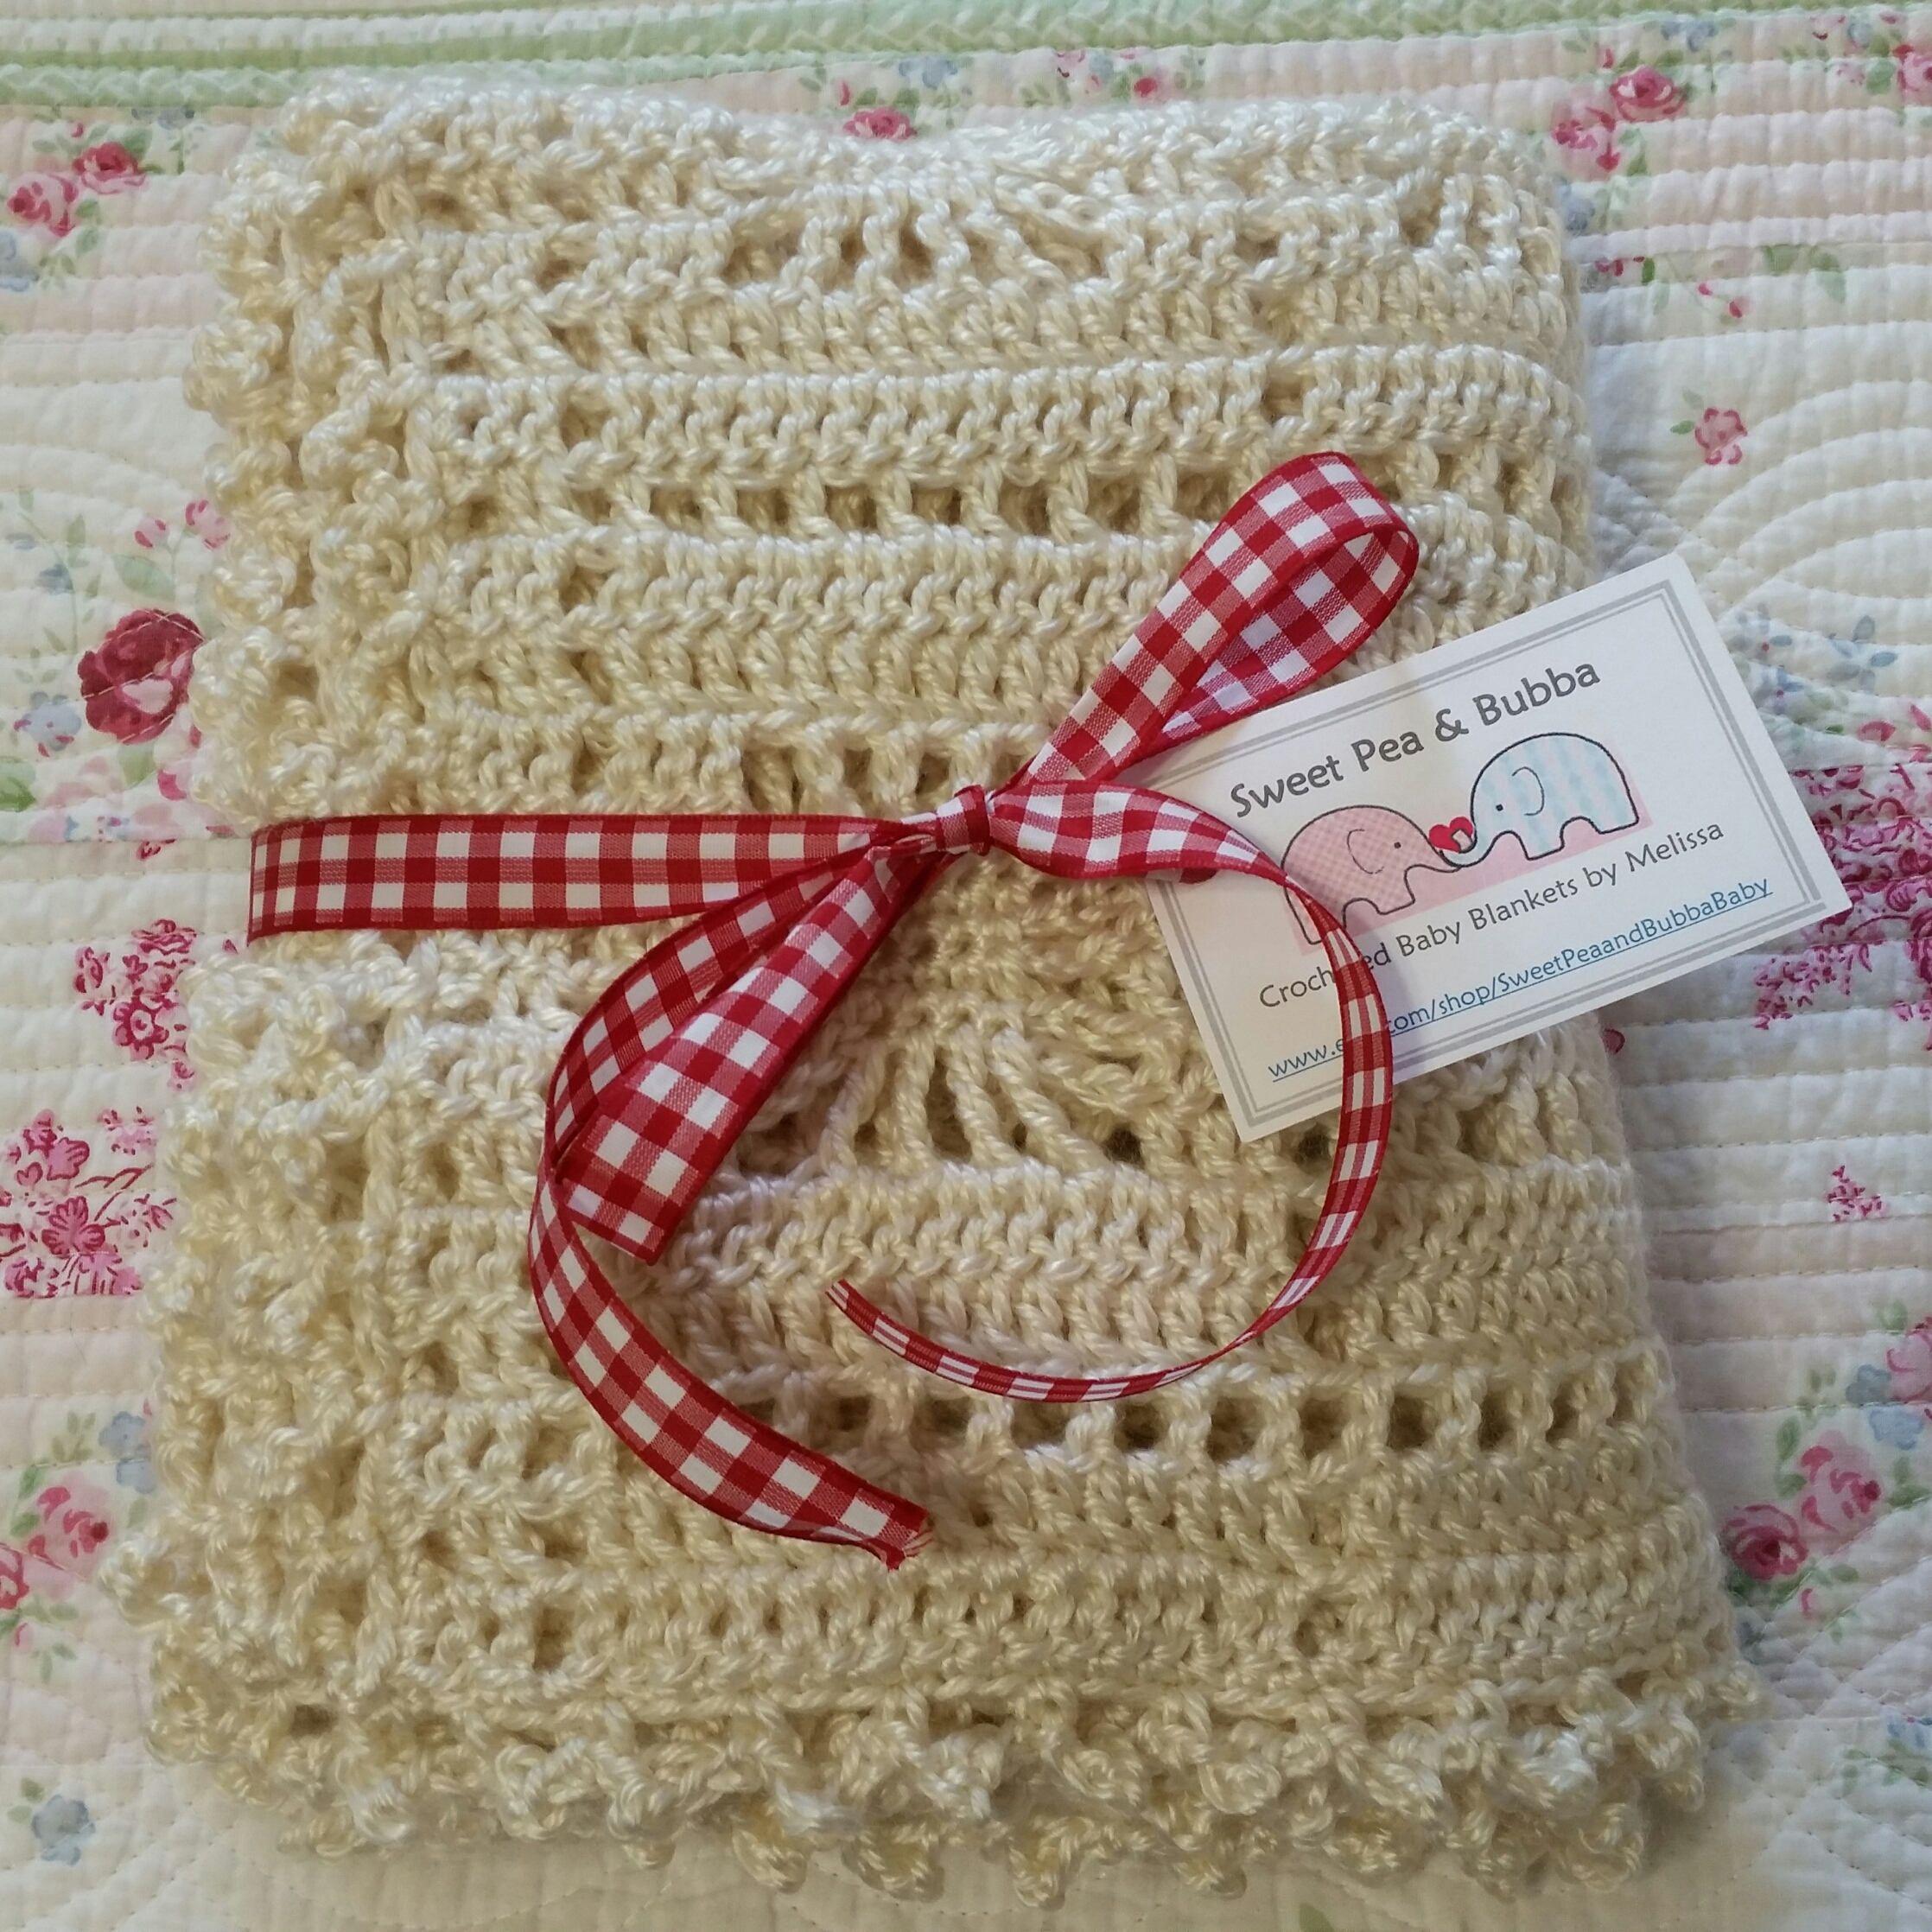 Crocheted snowflake baby blanket by sweetpeaandbubbababy